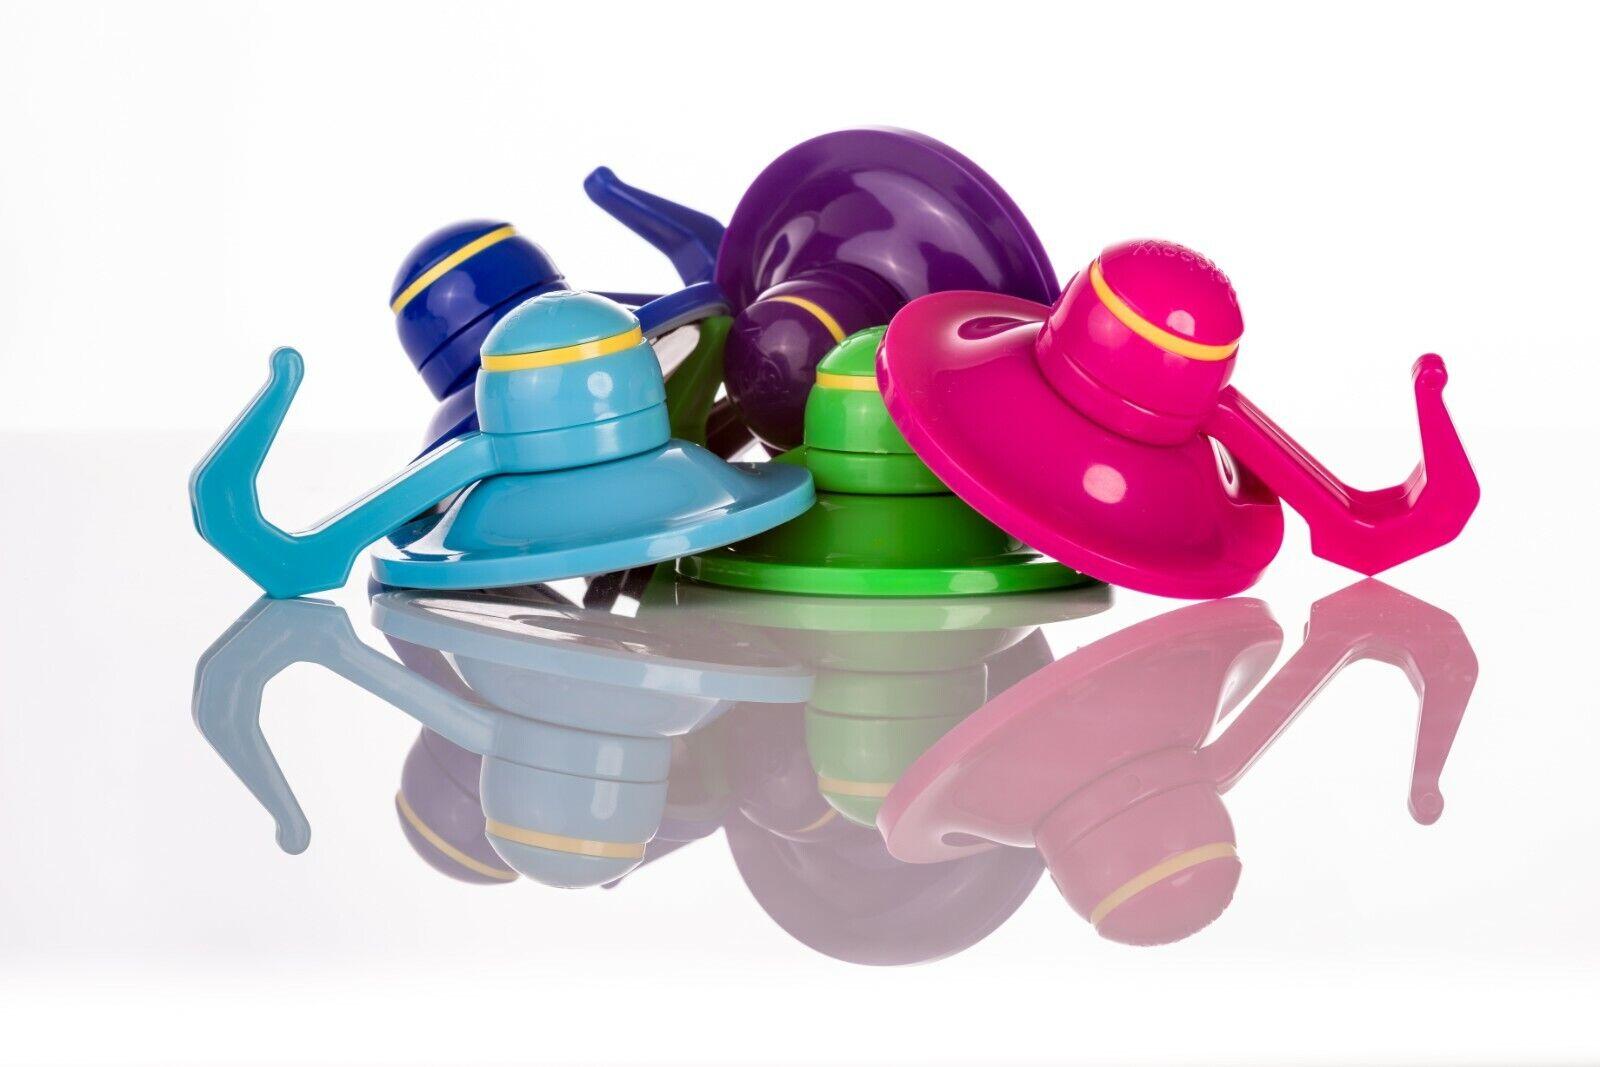 (5PCS) Suction Hooks for bathroom,Kitchen,organizer,reusable,Water Proof,Caravan